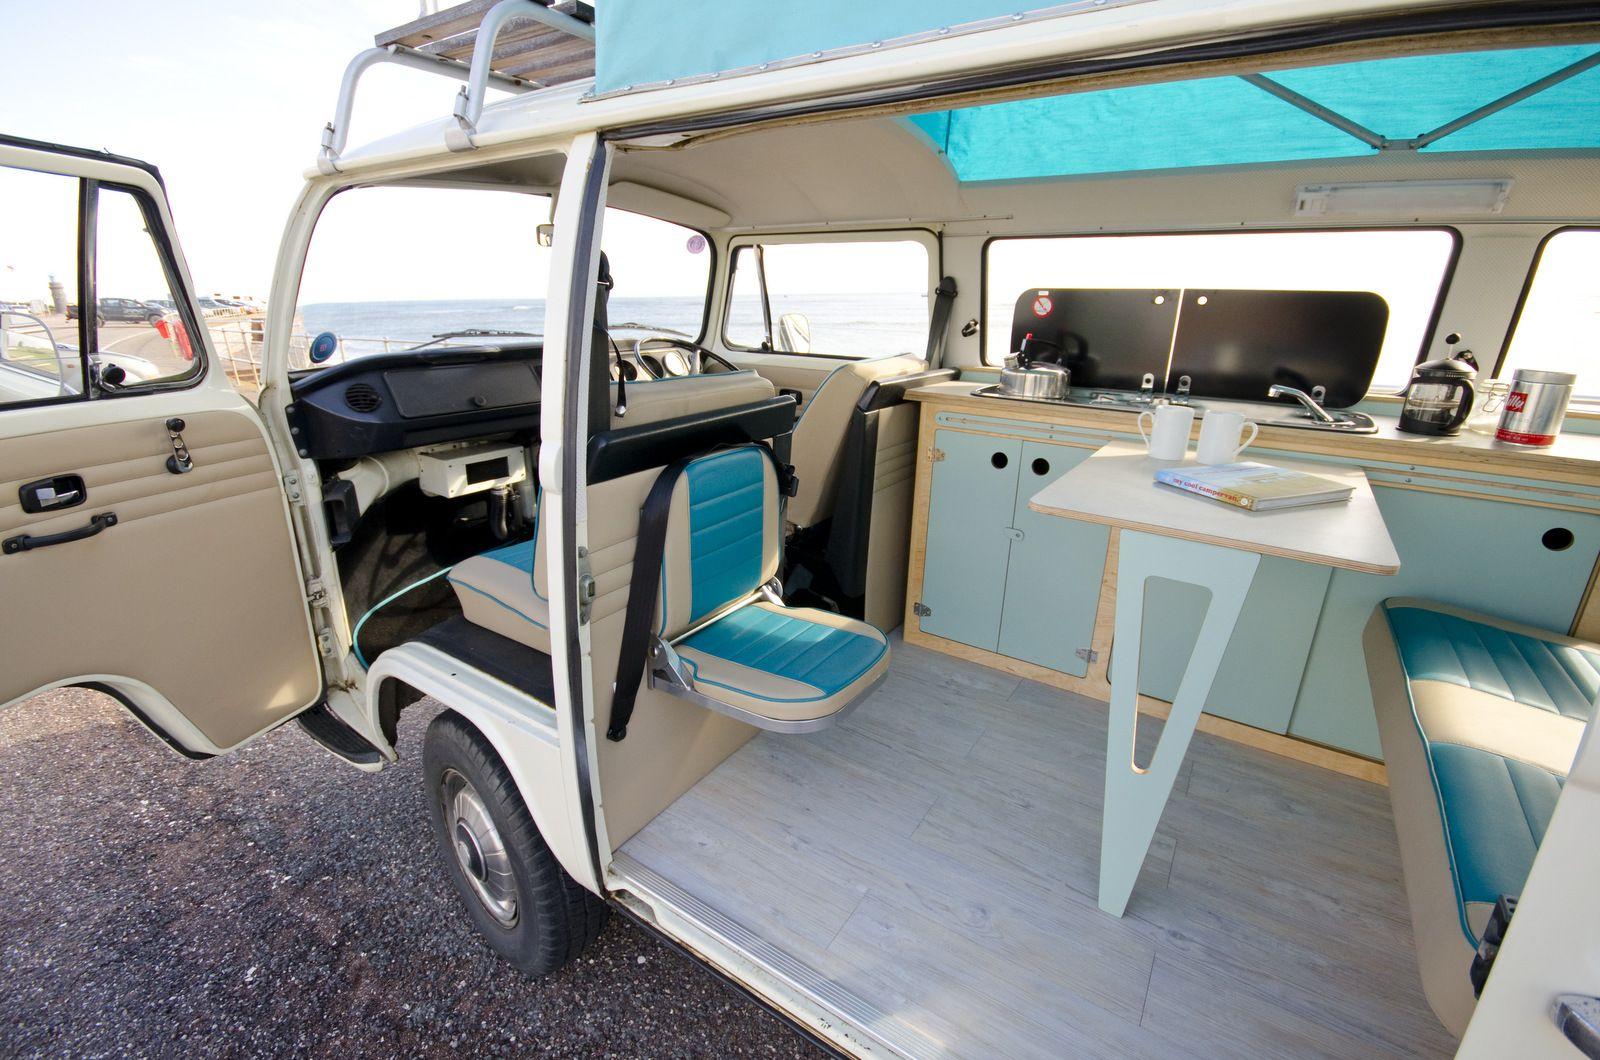 Vw camper buddy seat más t wv interier pinterest vw vans and